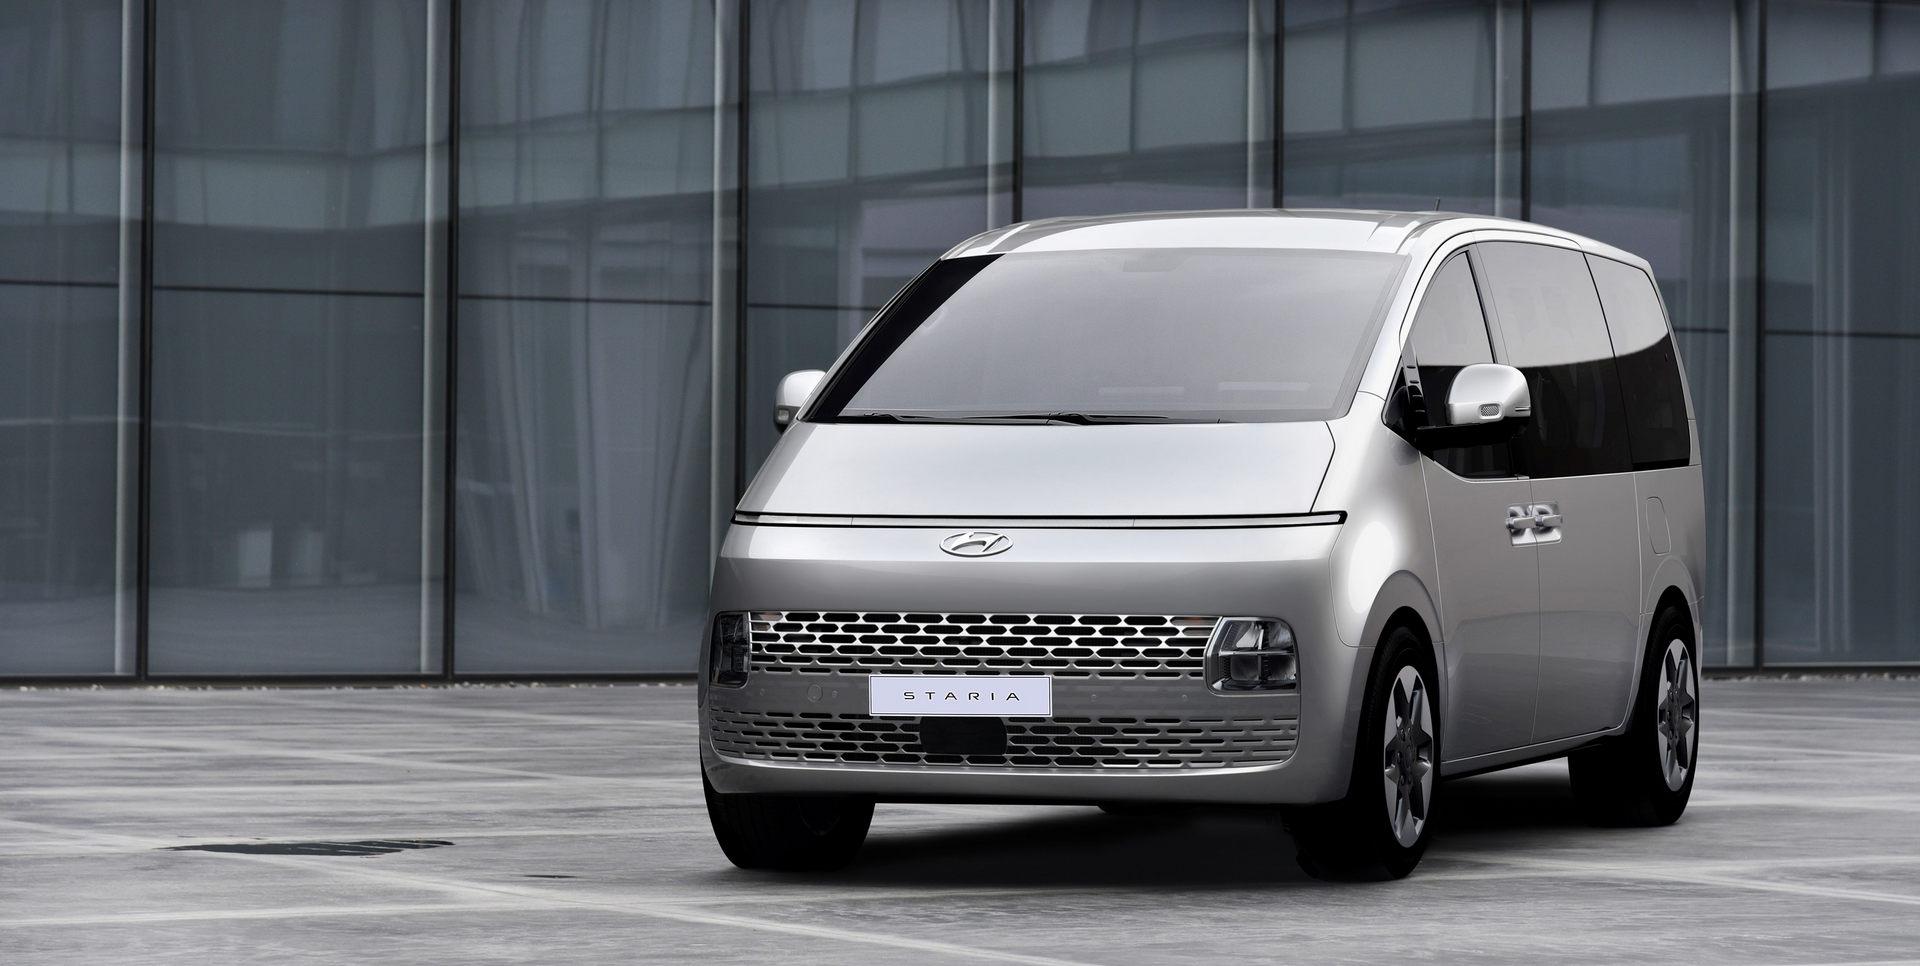 Hyundai-Staria-1 (1).jpg